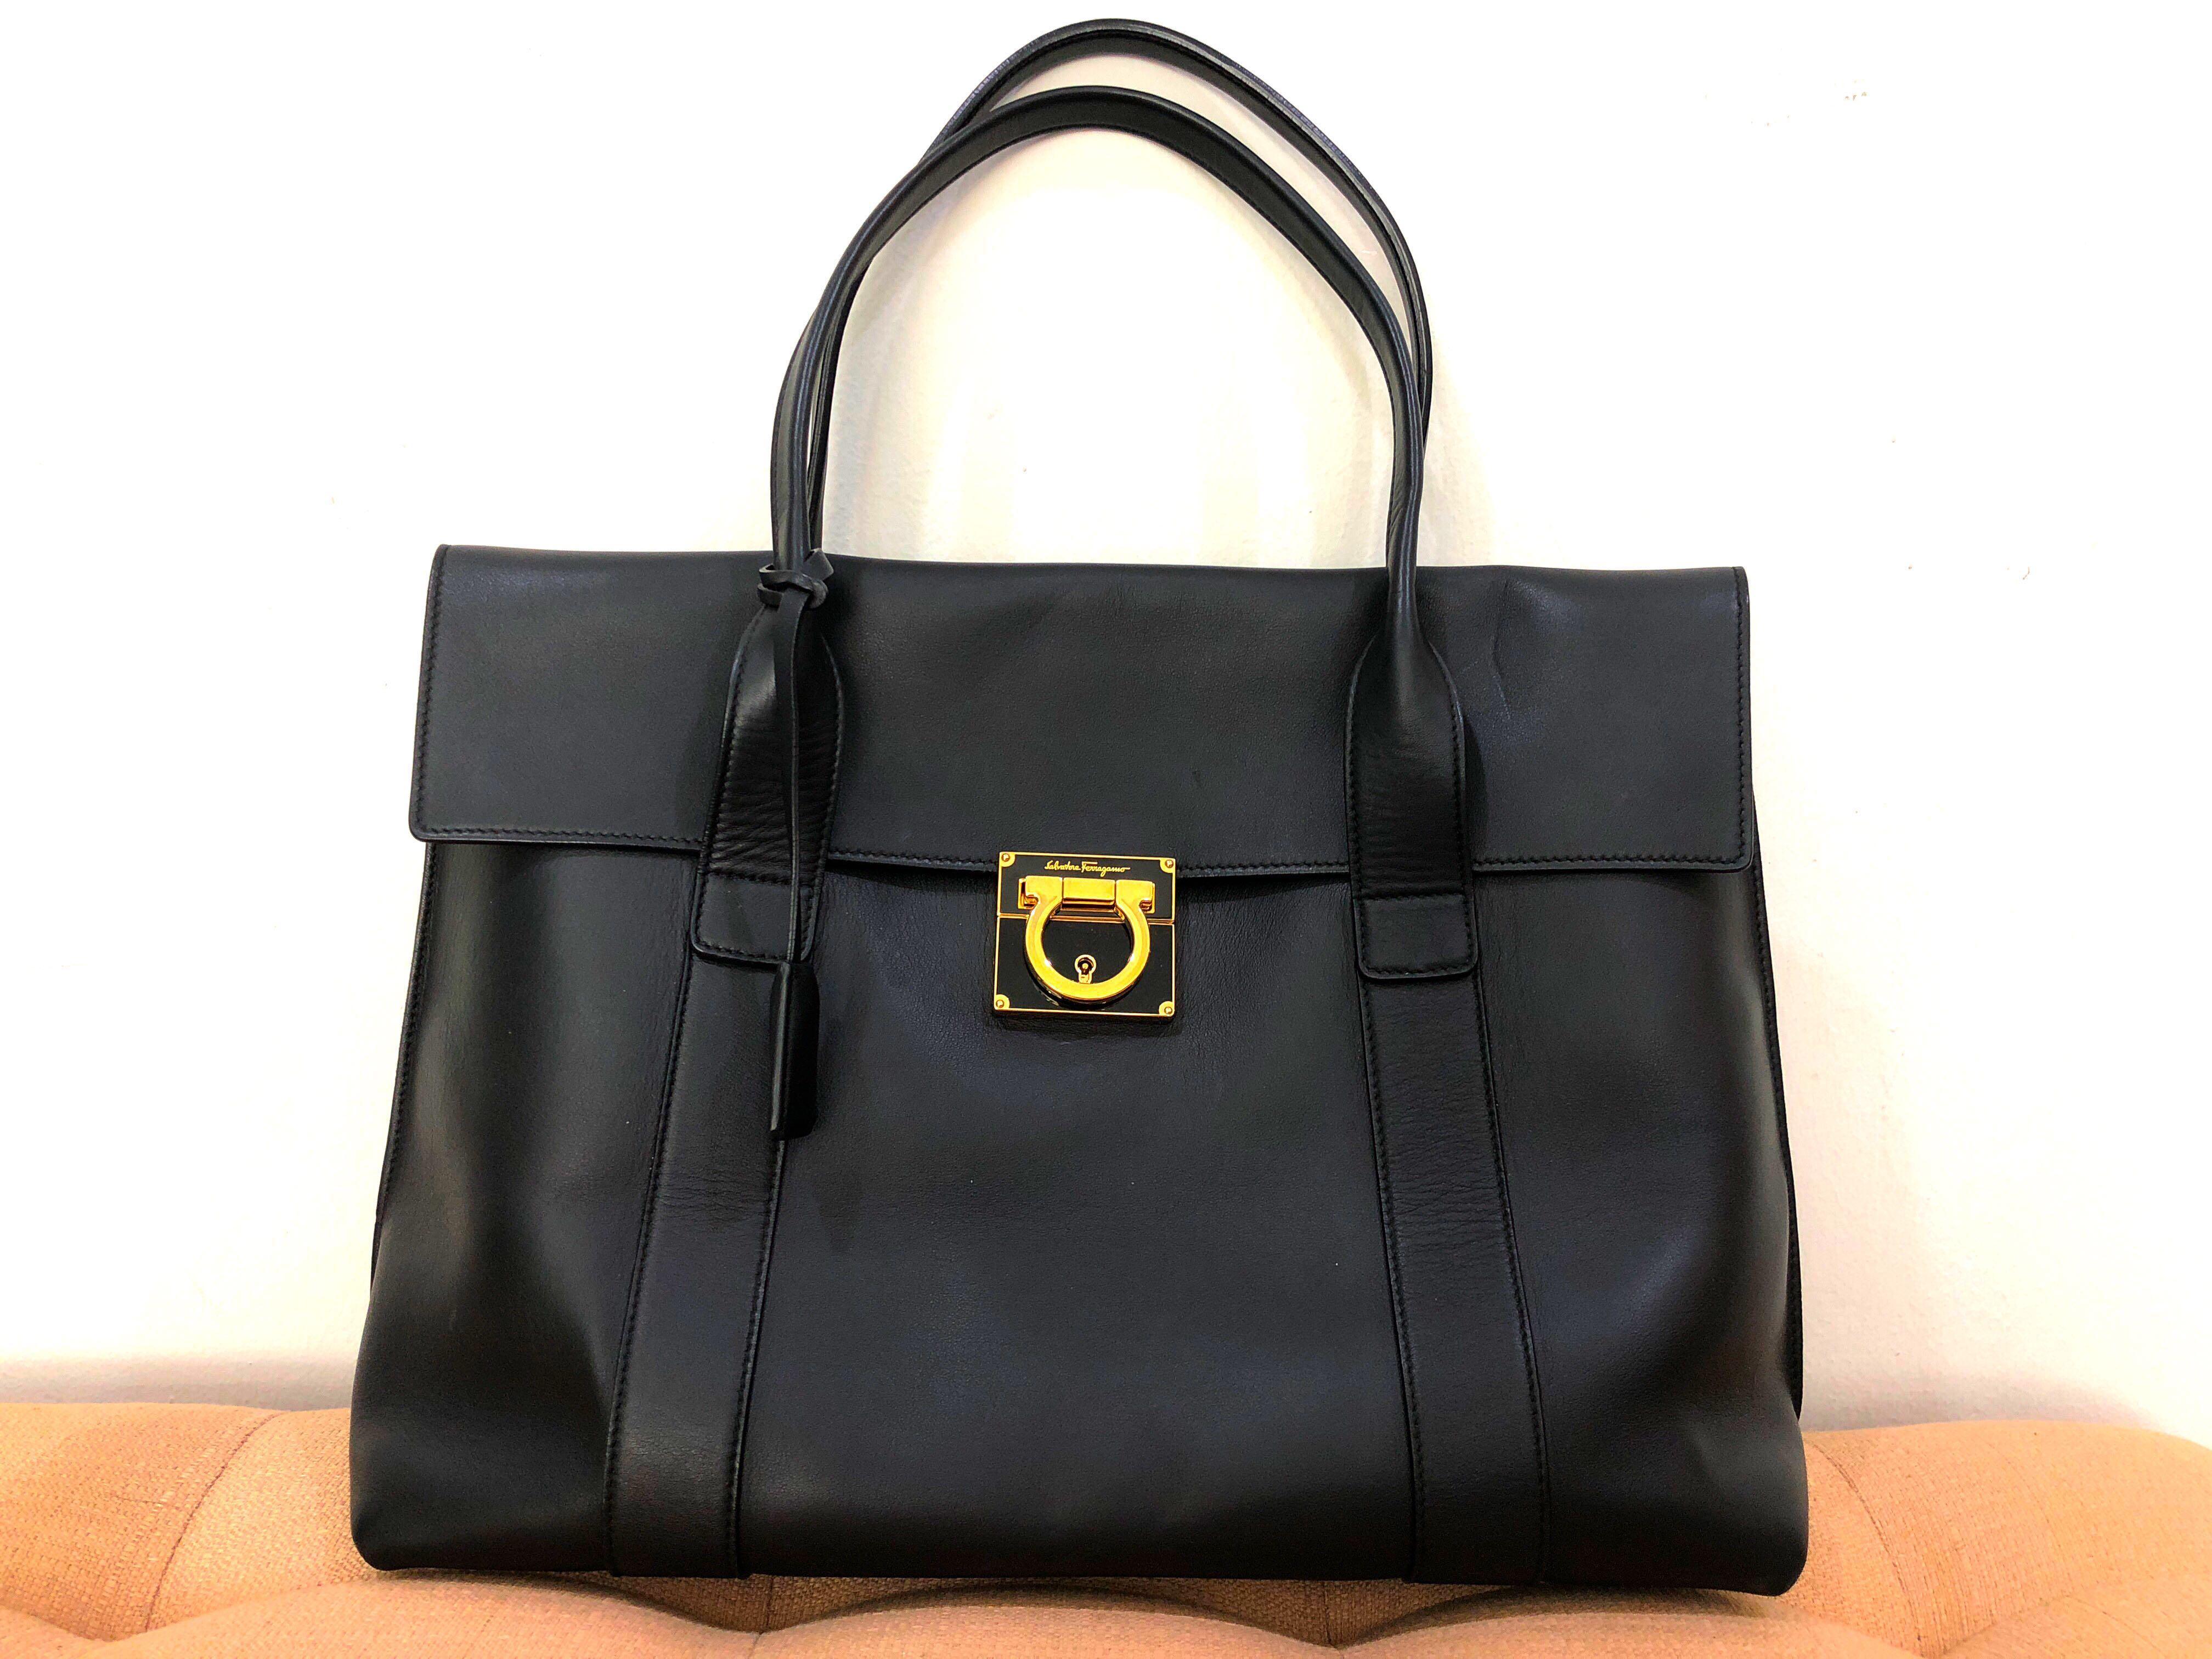 49995f07fe Full Leather Salvatore Ferragamo handbag